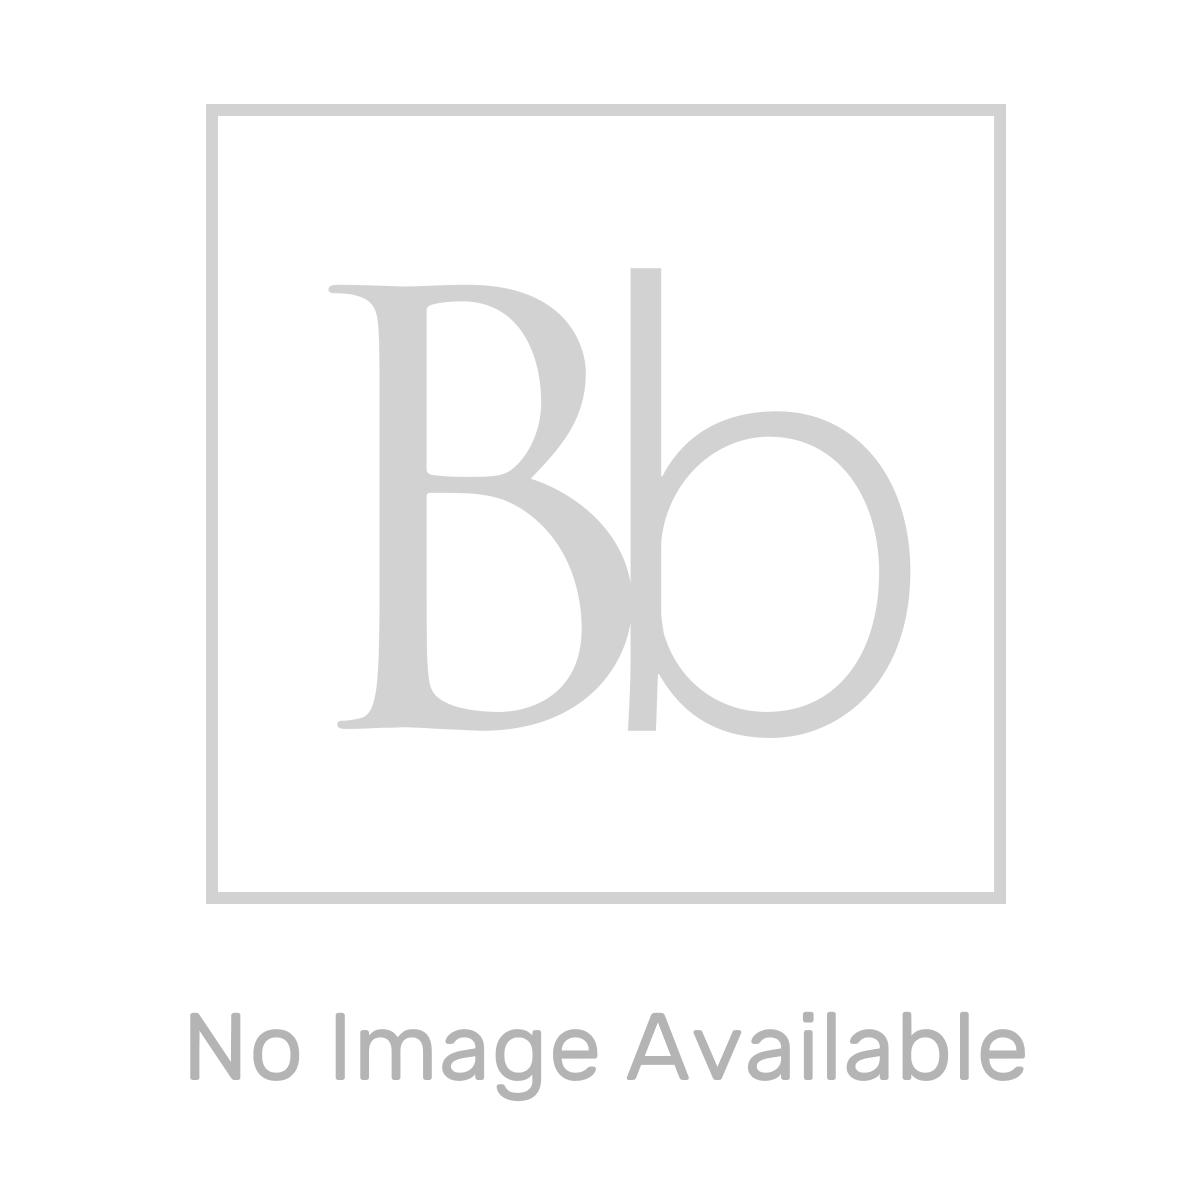 Aquadart Square 800 x 800 Shower Tray